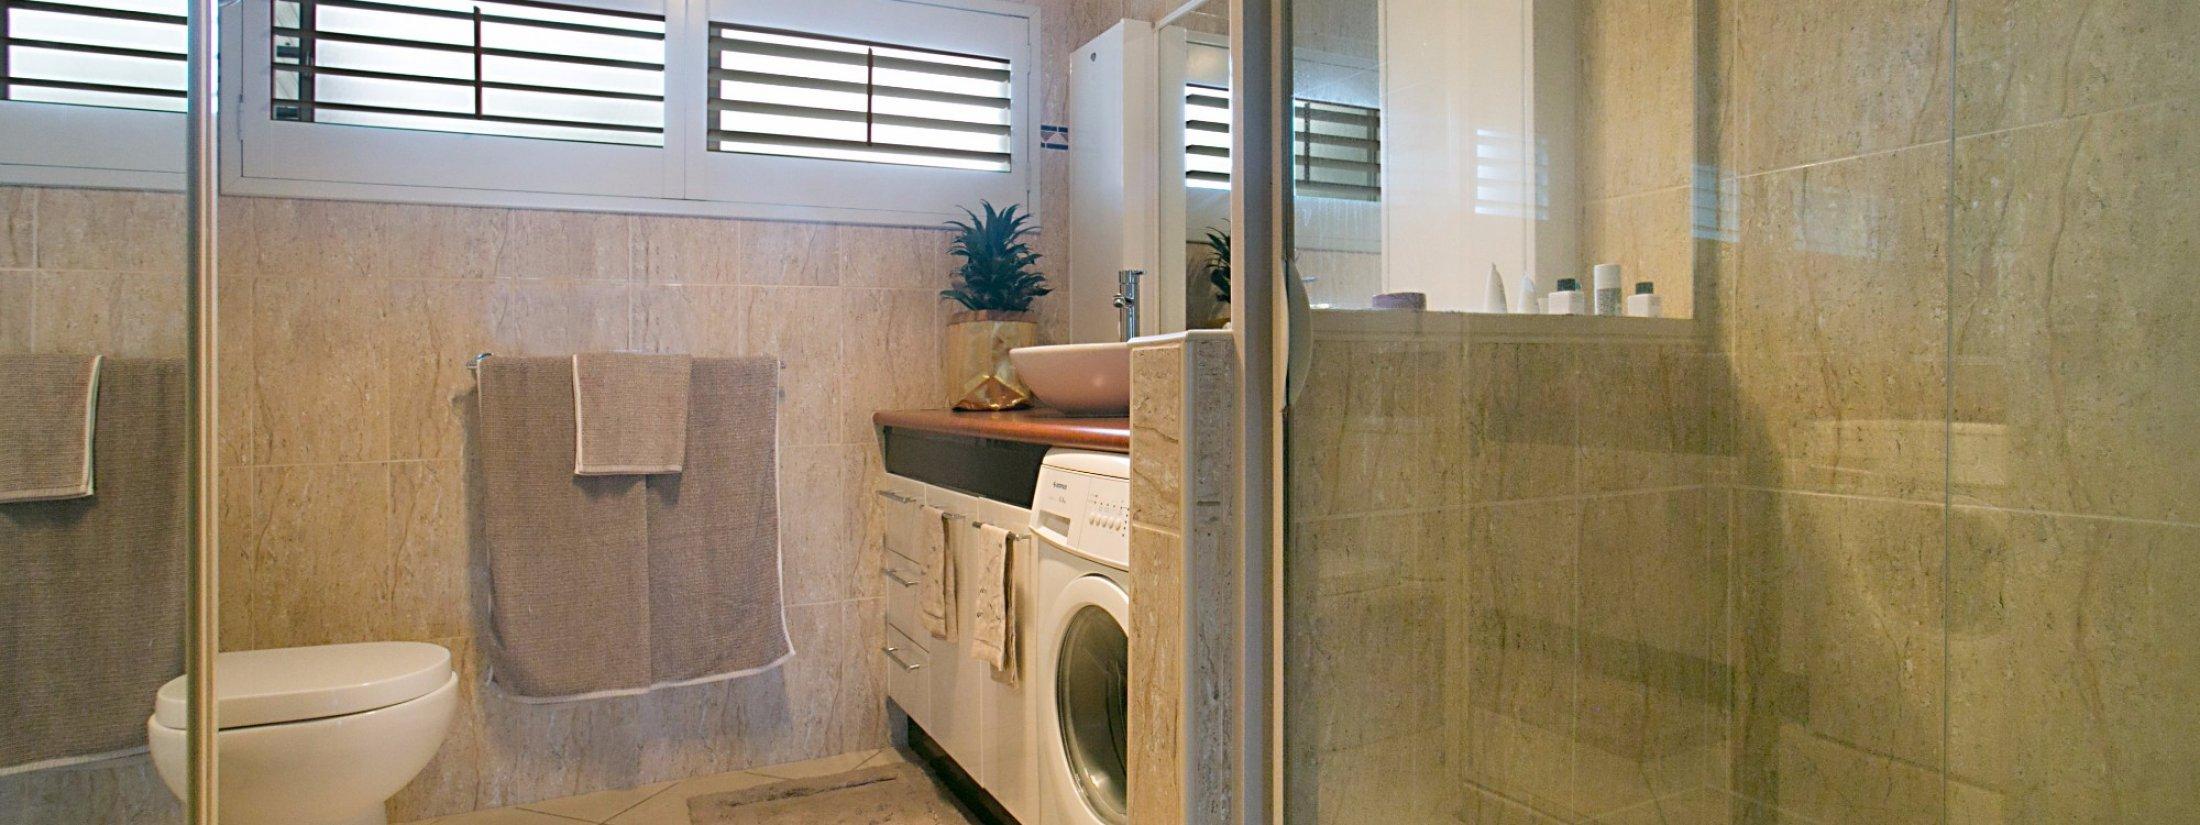 La Casetta - Broadbeach - Bathroom and laundry